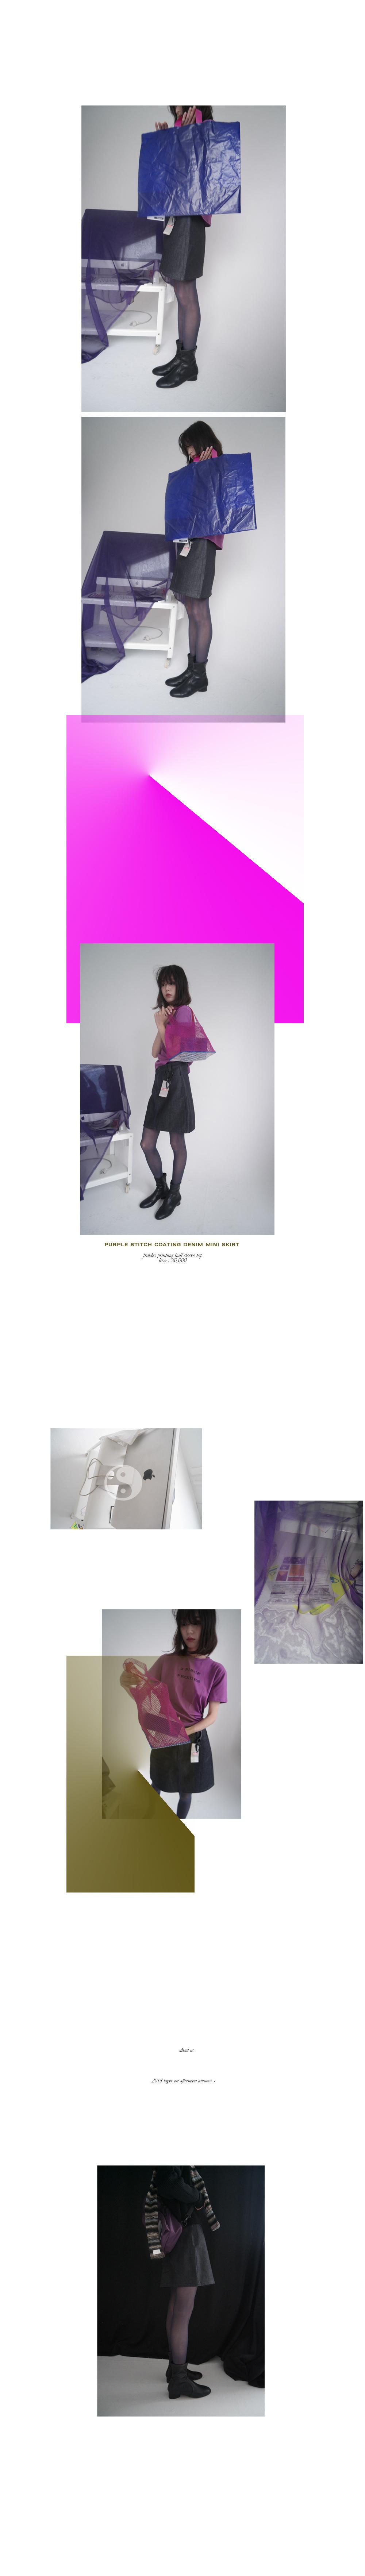 purple stitch coating denim mini skirt